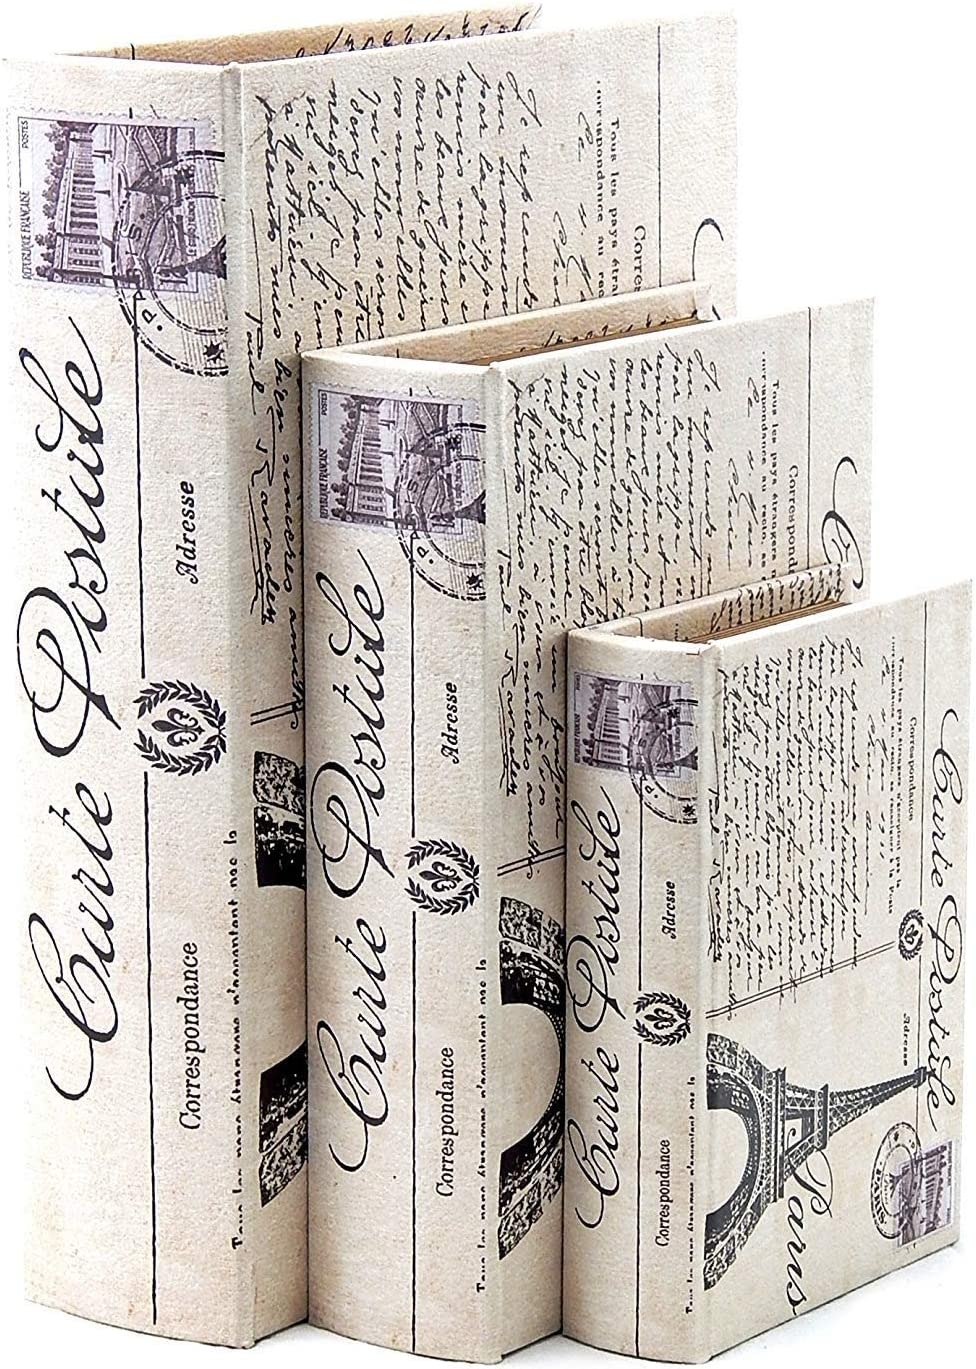 Bellaa 28069 Paris Book Box Eiffel Tower Set of 3